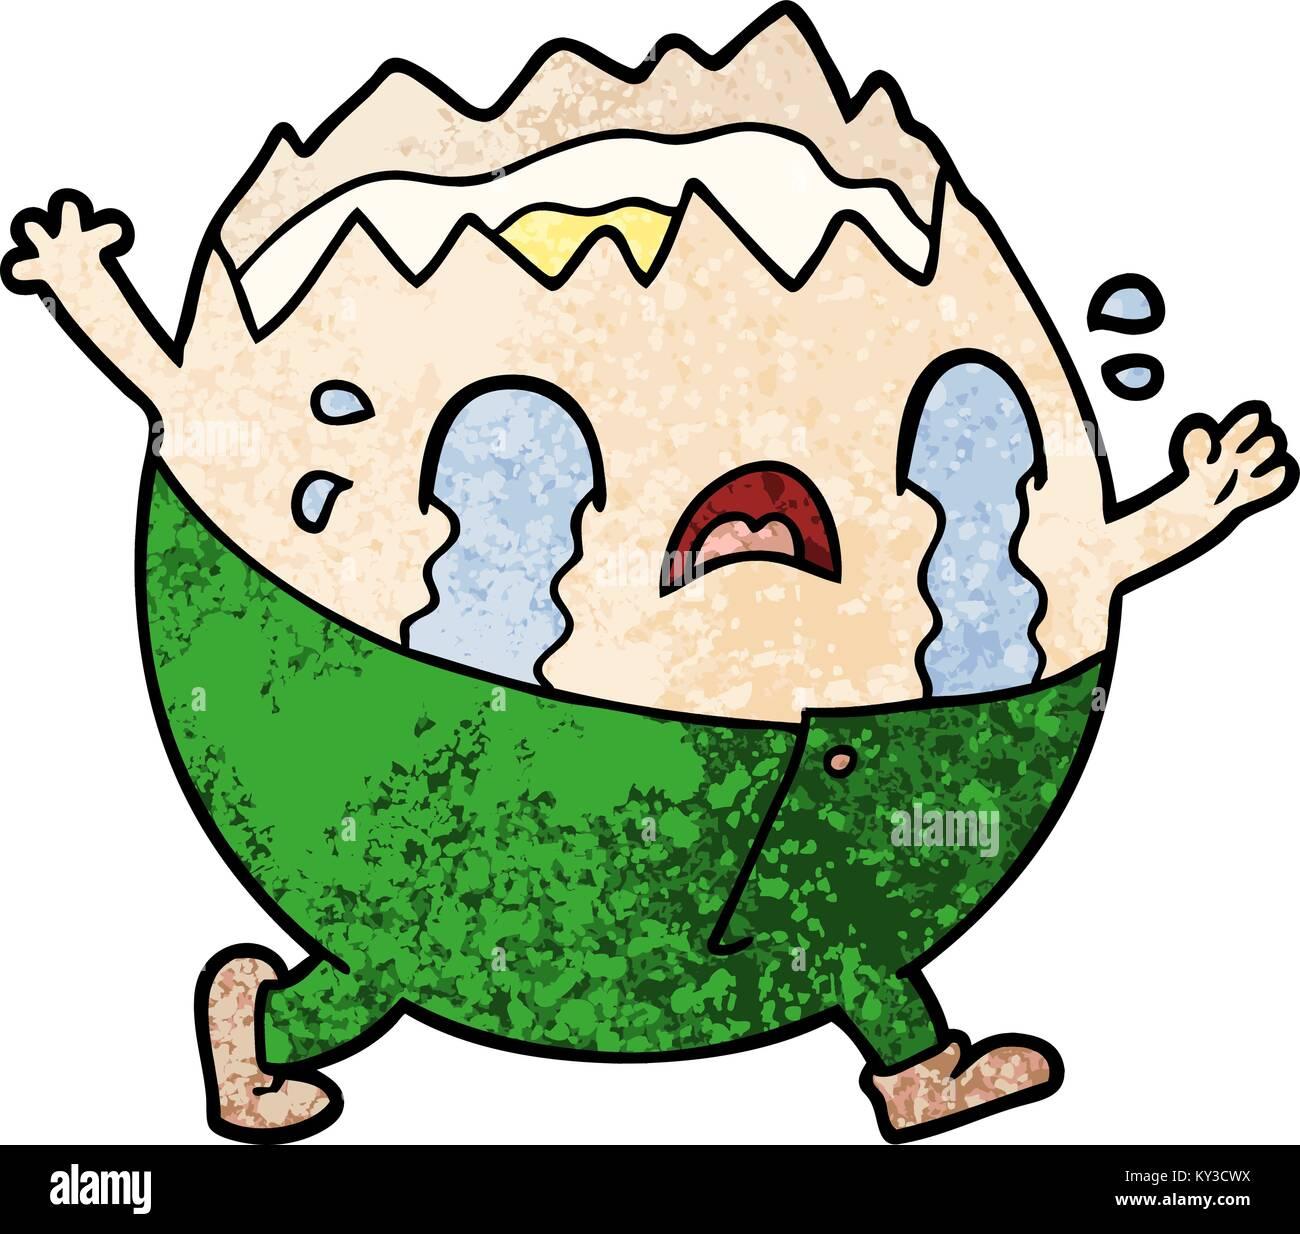 humpty dumpty cartoon egg man crying Stock Vector